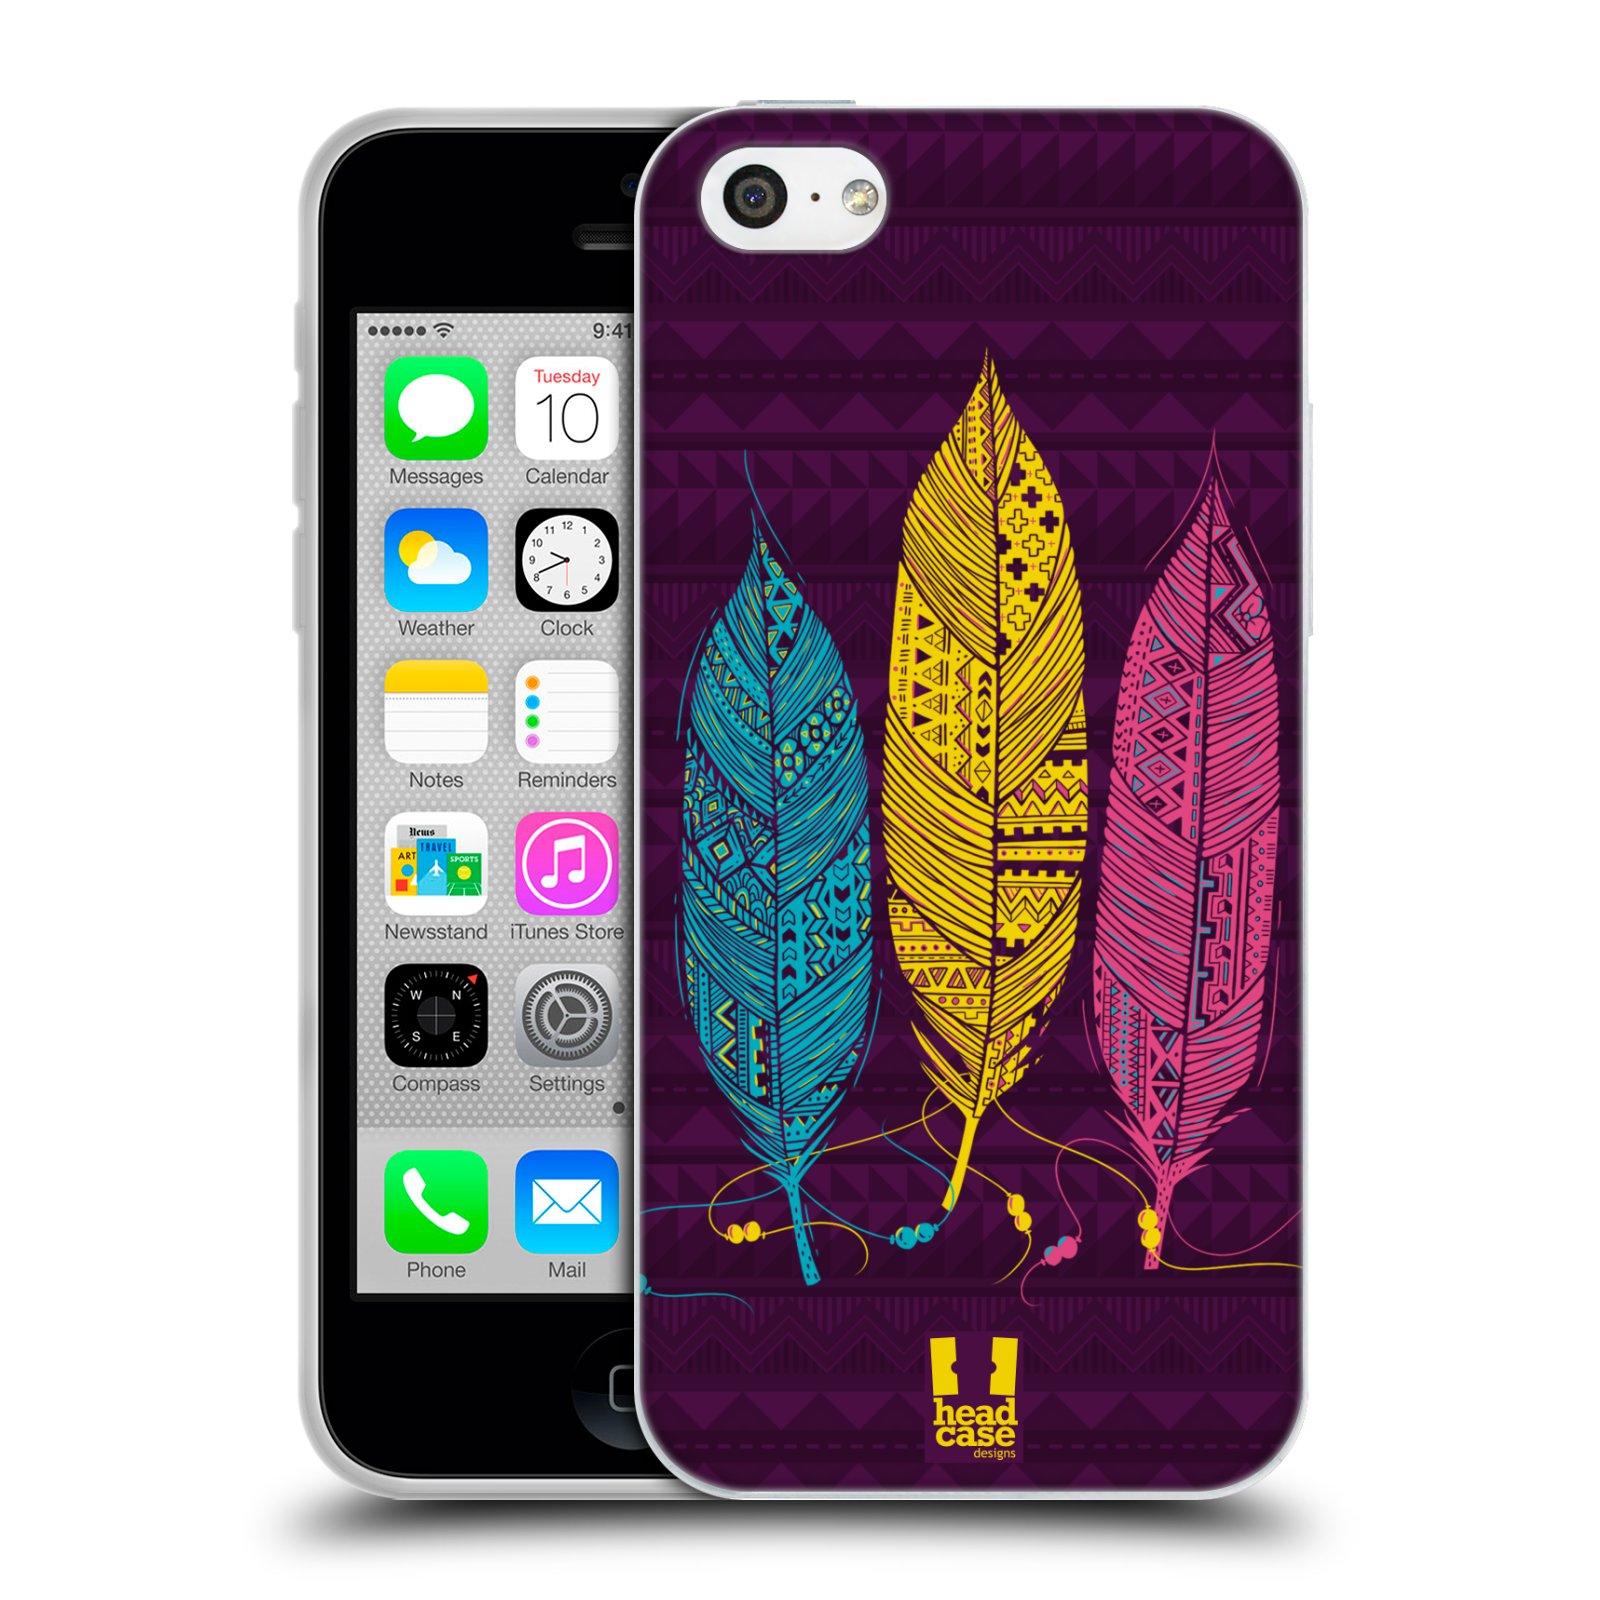 Silikonové pouzdro na mobil Apple iPhone 5C HEAD CASE AZTEC PÍRKA 3 BAREV (Silikonový kryt či obal na mobilní telefon Apple iPhone 5C)